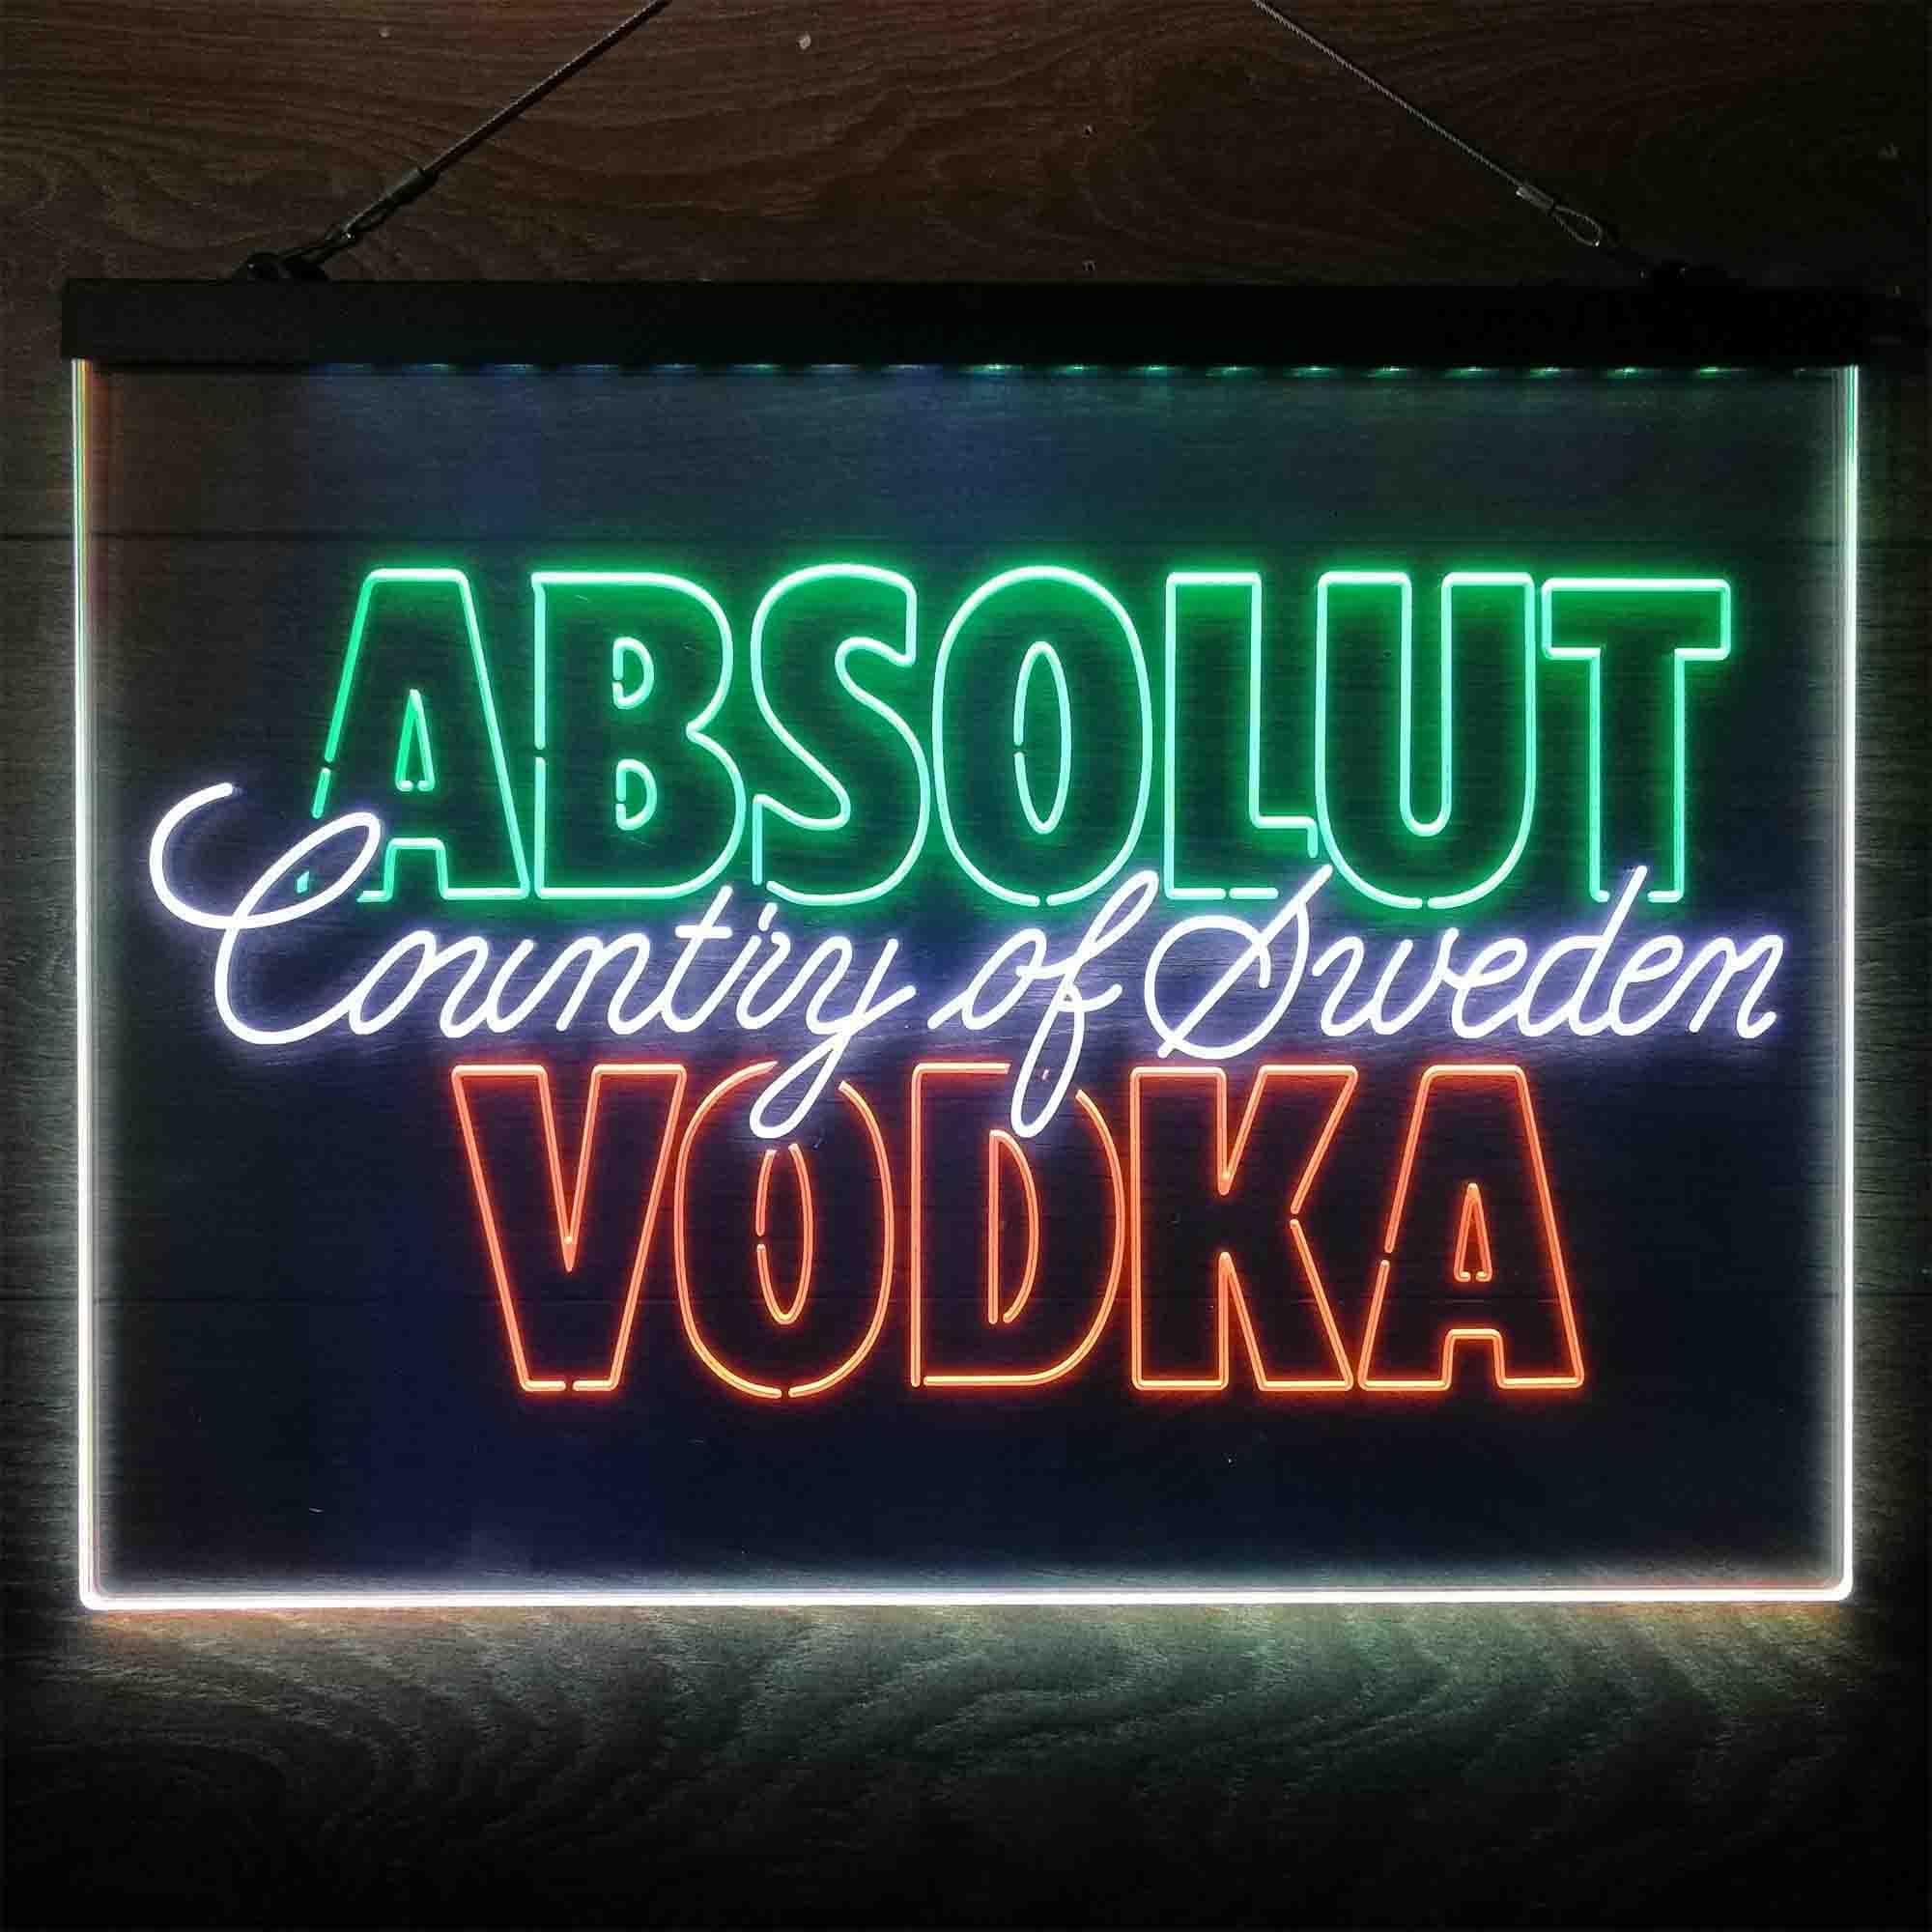 vodka neon signs